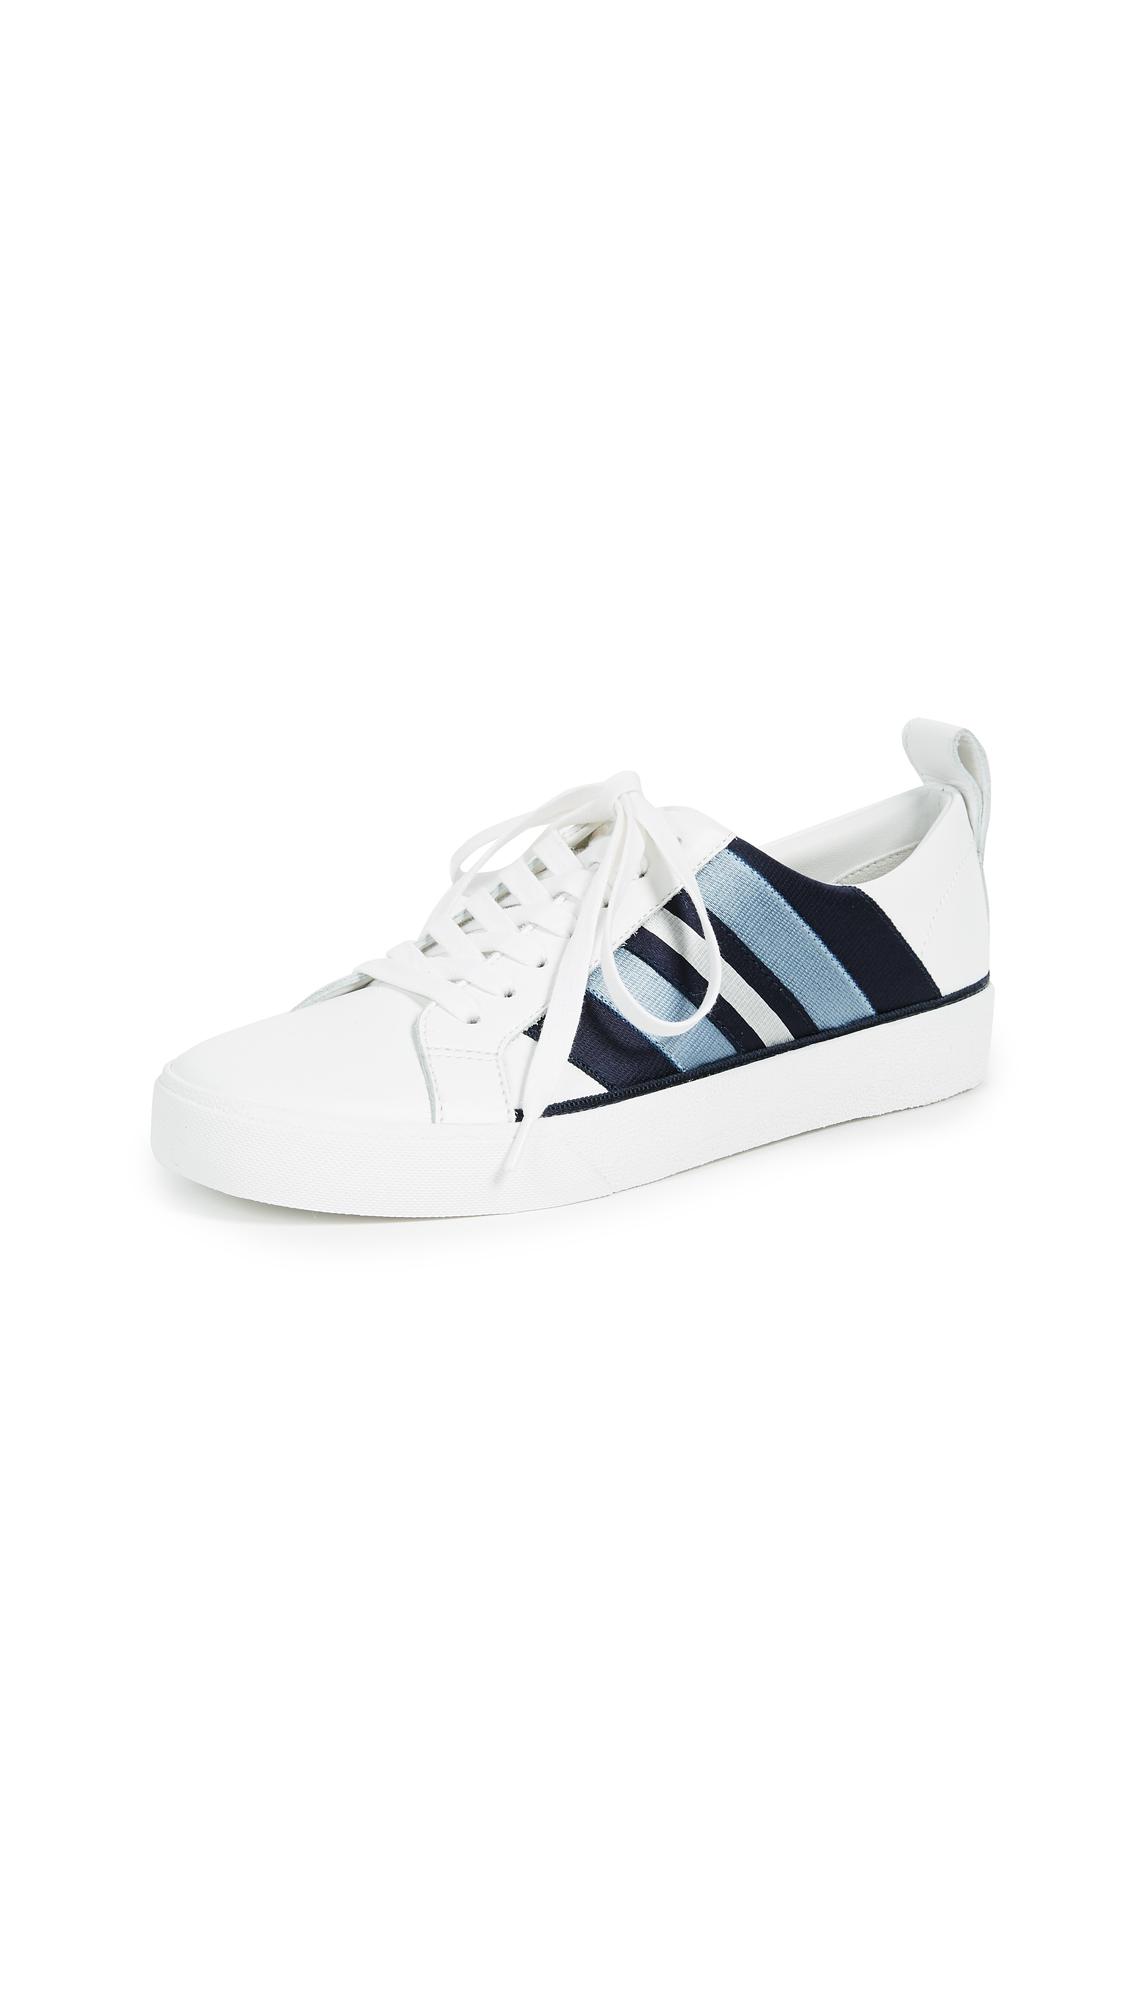 Diane von Furstenberg Tess Sneakers - White/Blue